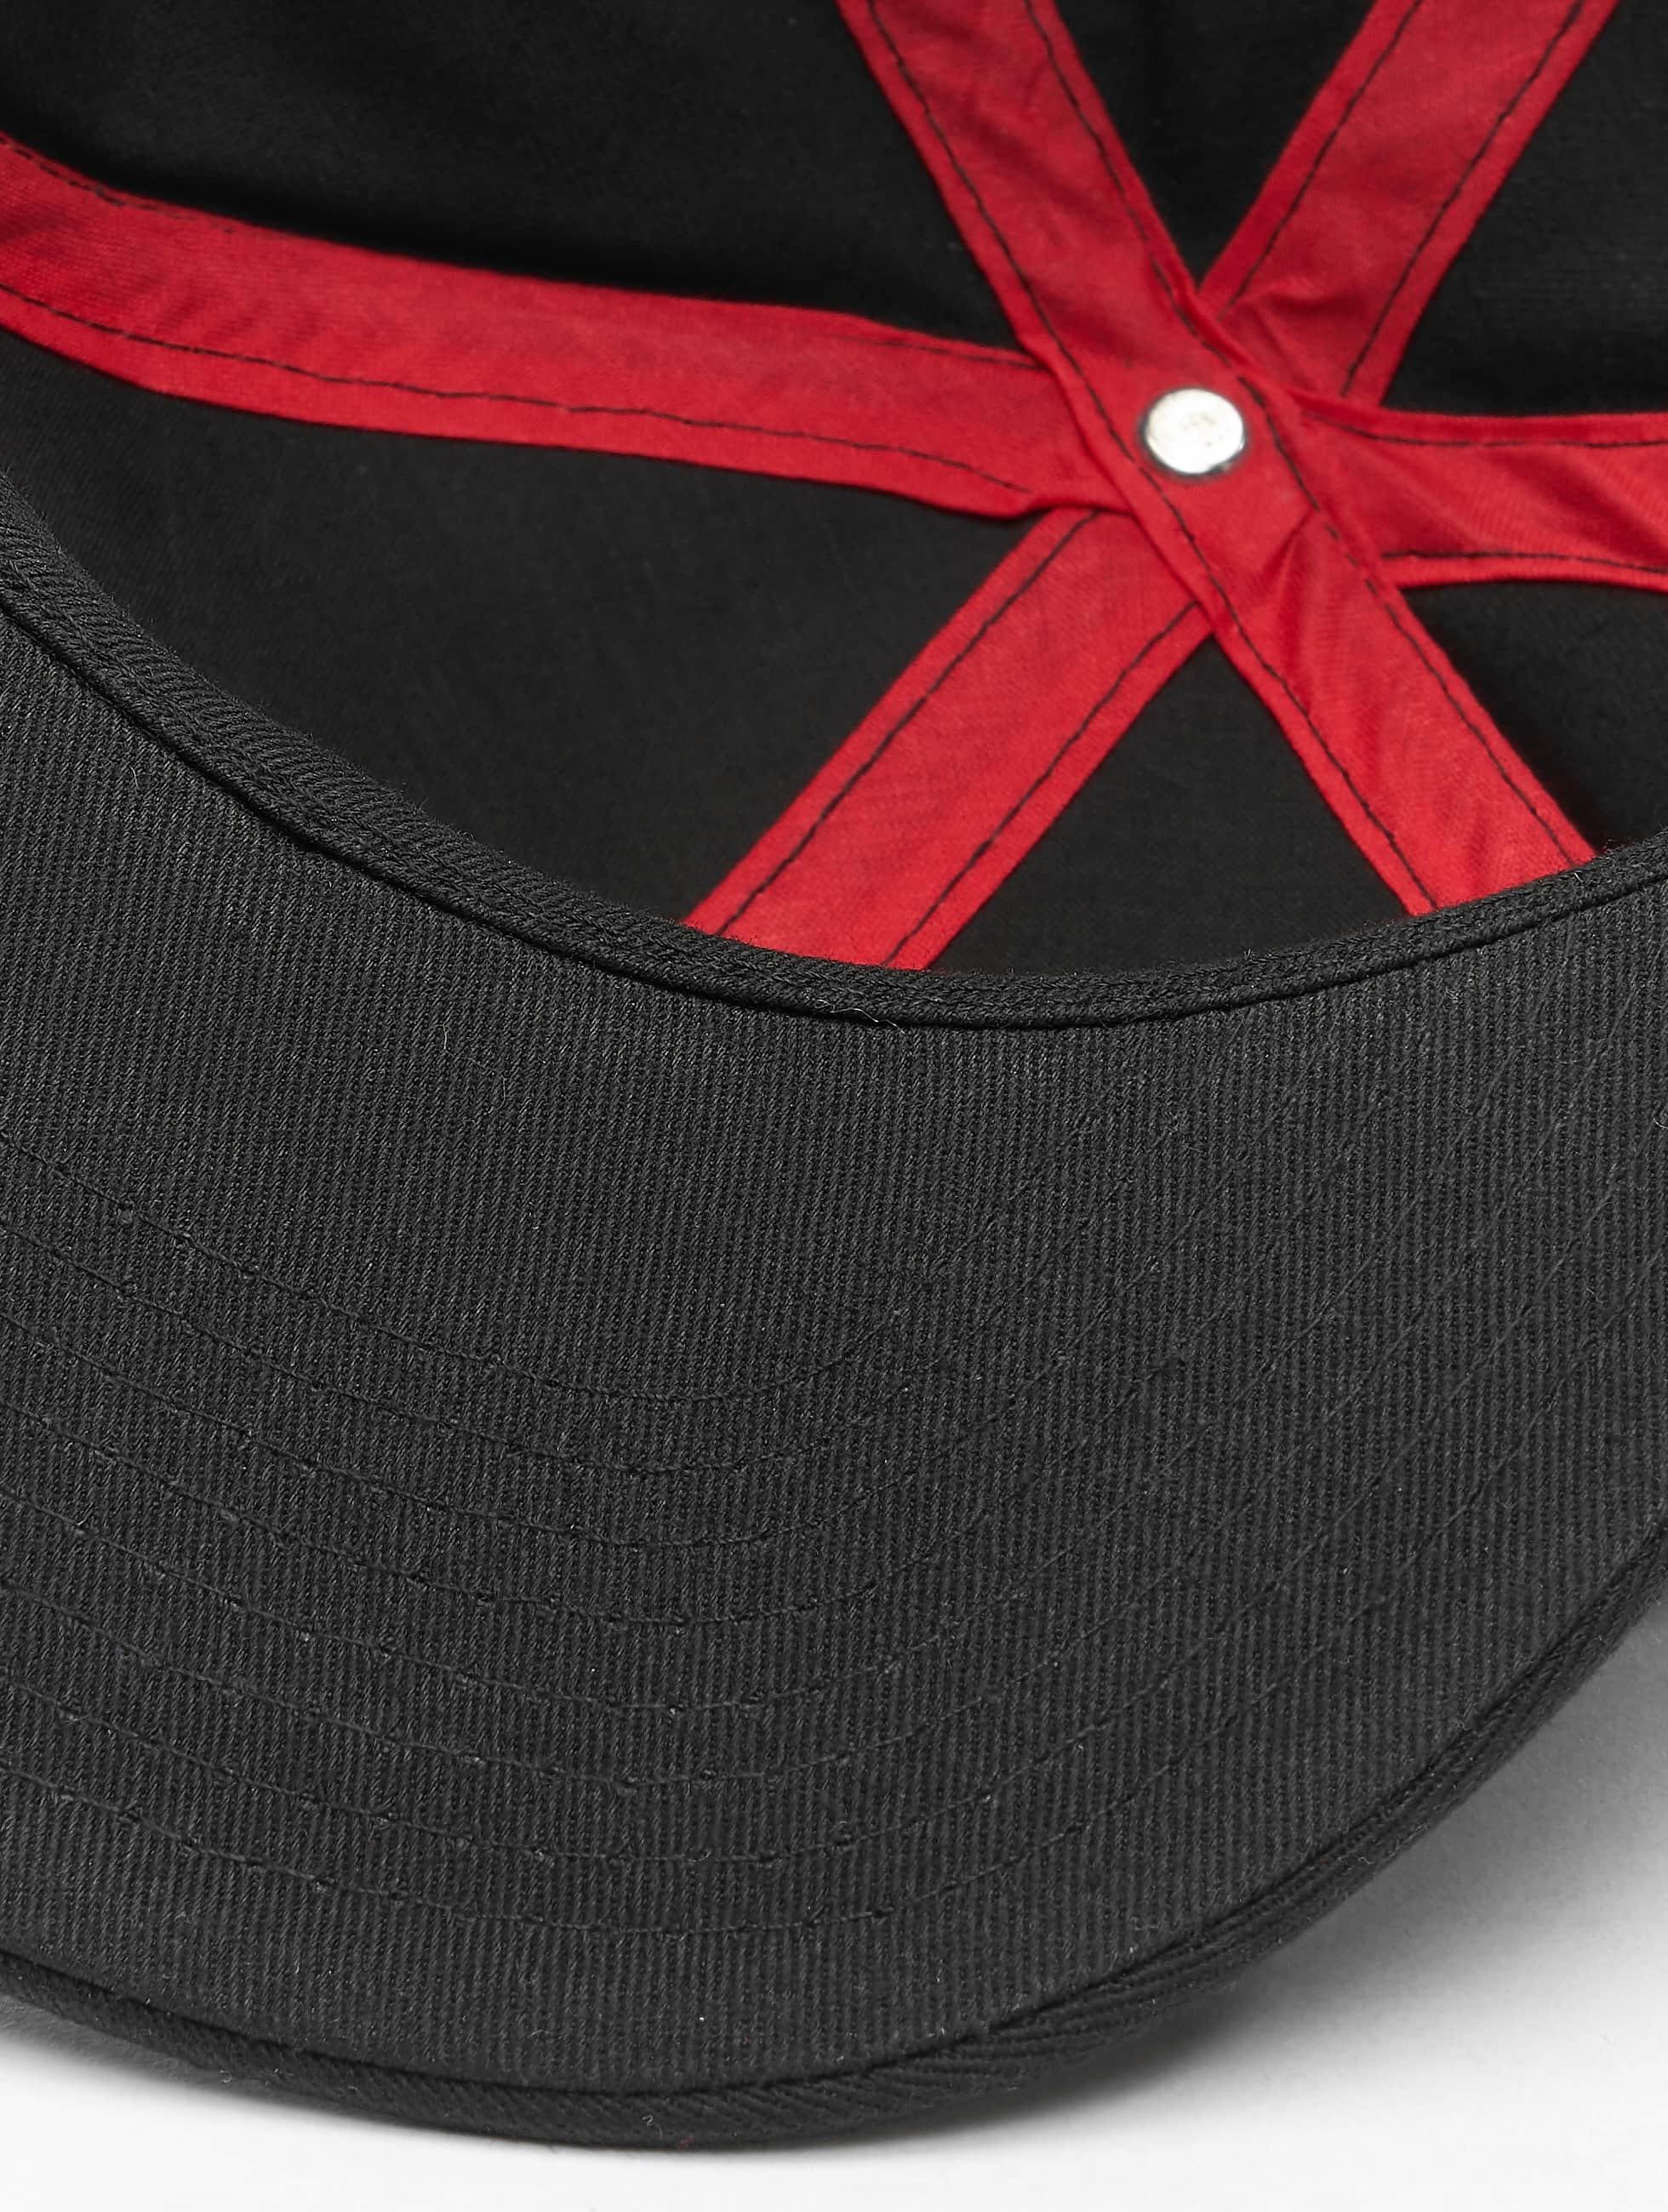 MSTRDS Casquette Snapback & Strapback Z Lette noir